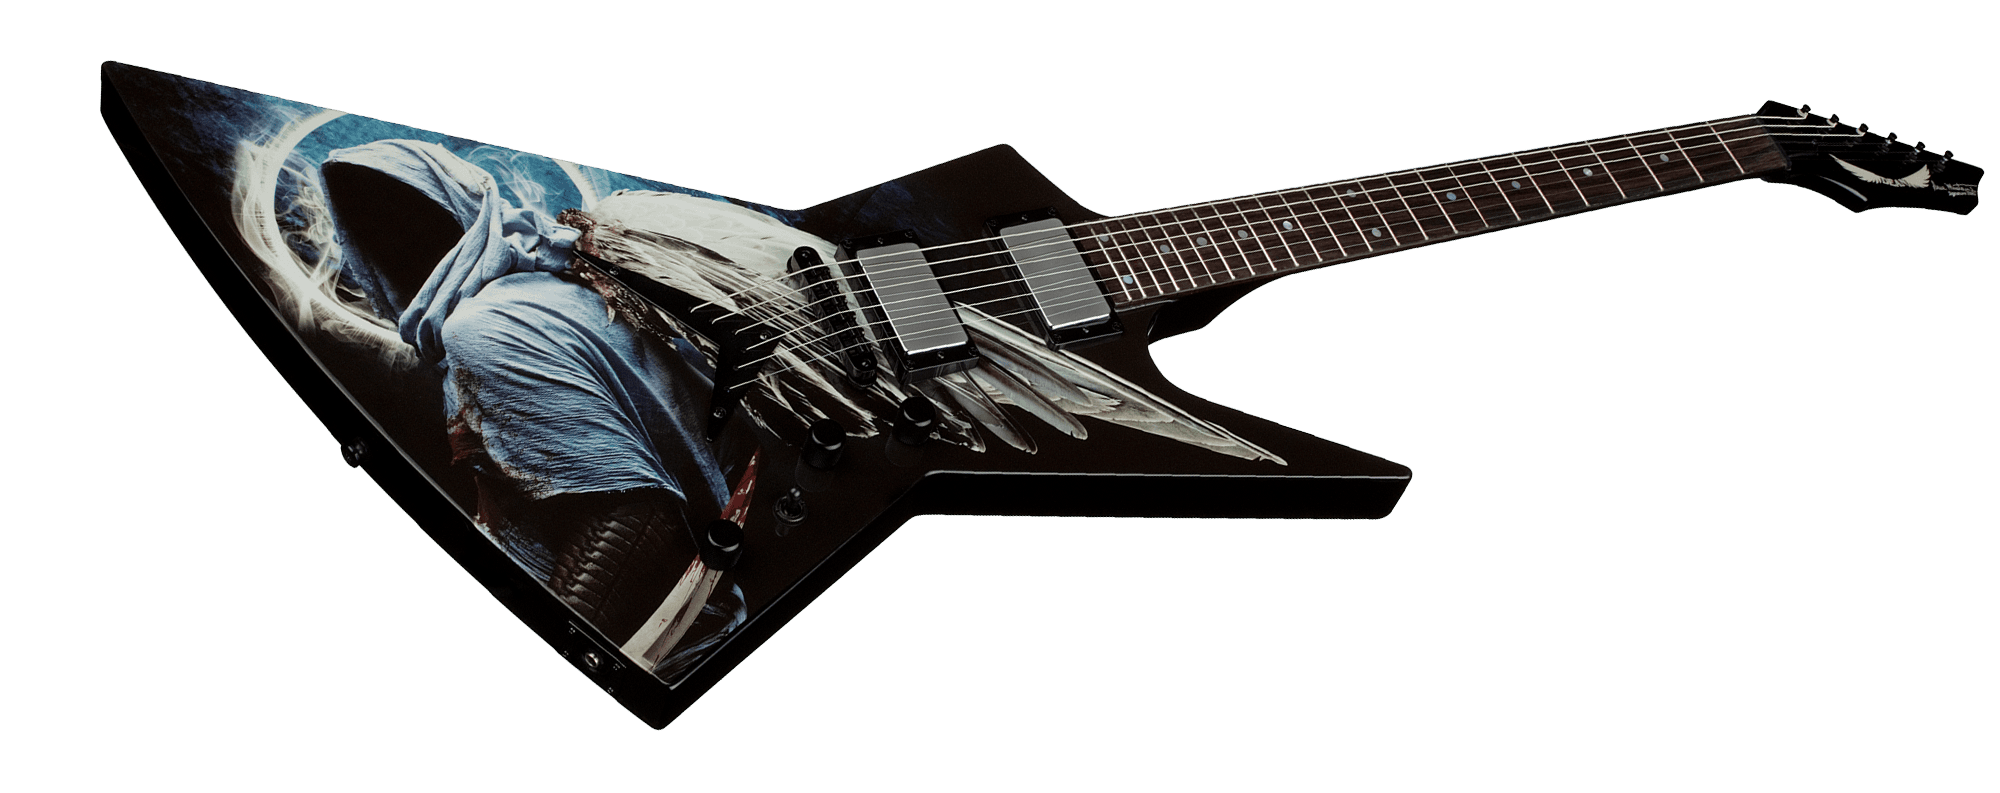 ZEROAODII - Zero Dave Mustaine  - Angel Of Death II